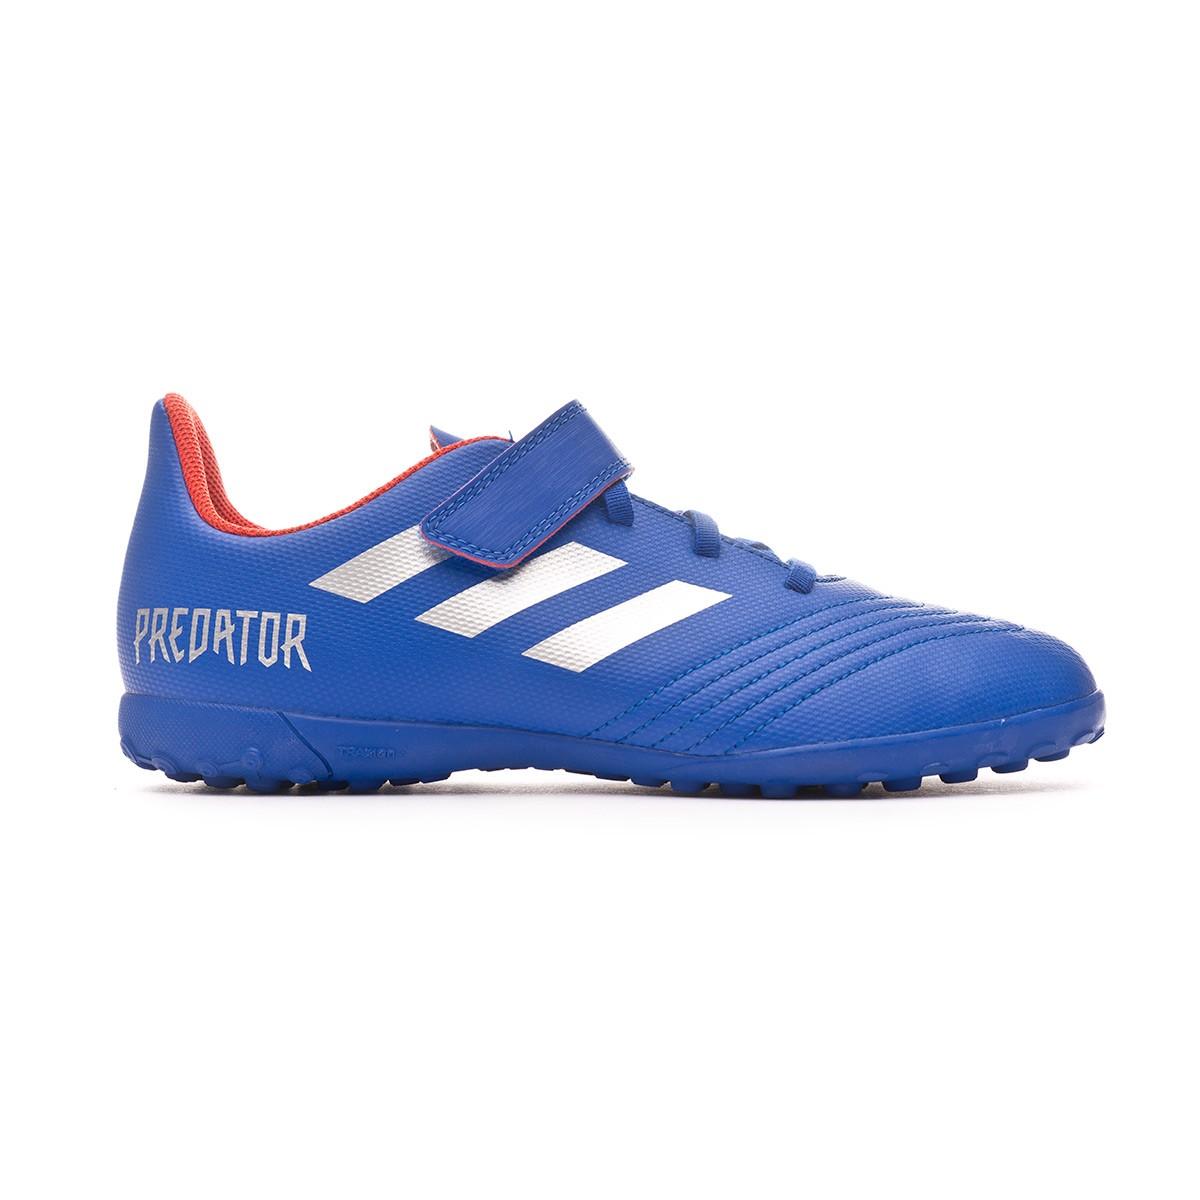 16781e777 Football Boot adidas Predator Tango 19.4 Turf H  Bold blue-Silver  metallic-Active red - Football store Fútbol Emotion